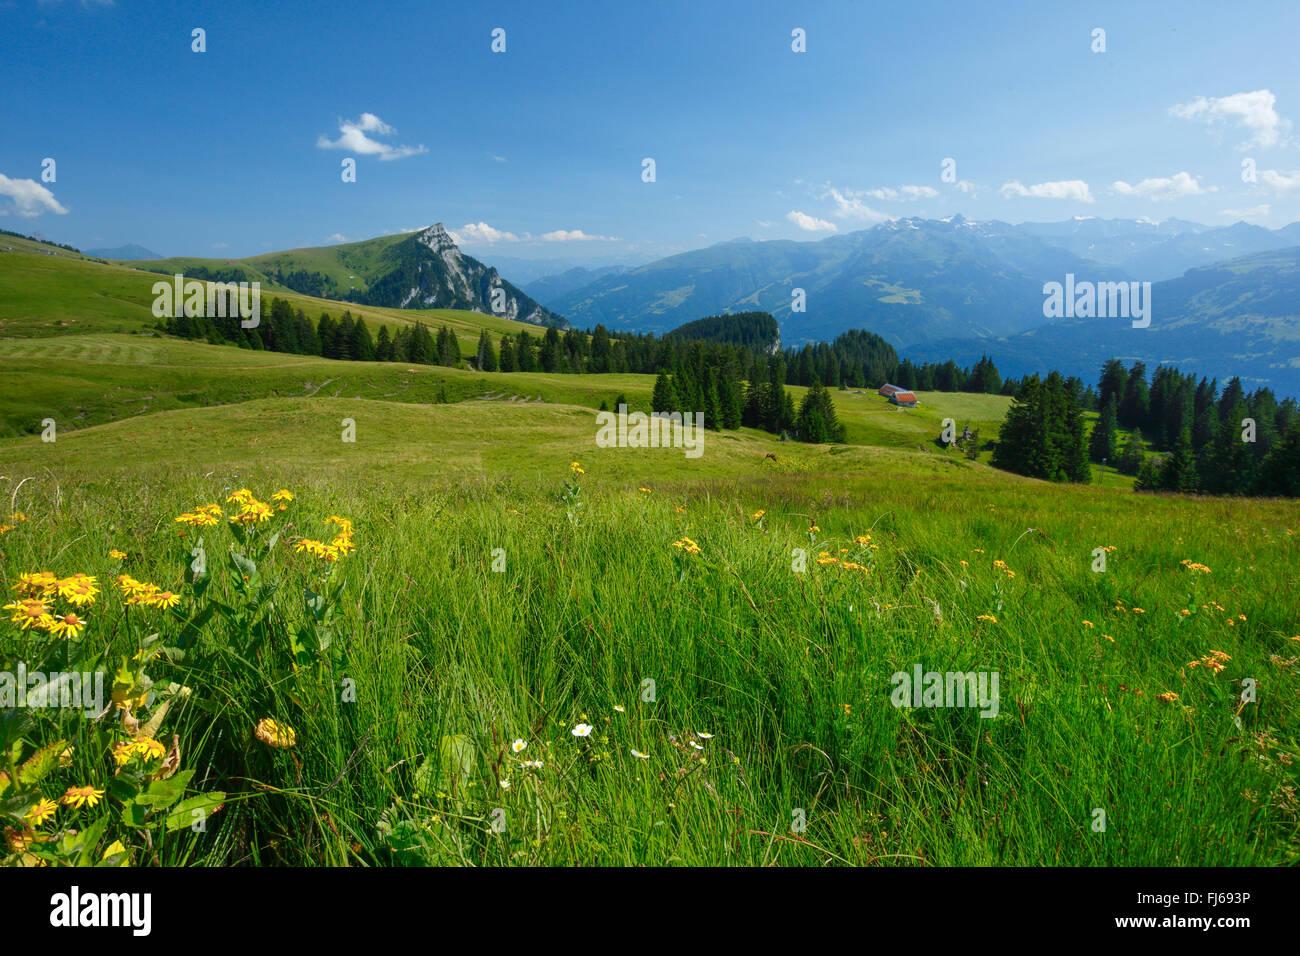 Alp Palfries with Tschuggen, Switzerland, St. Gallen - Stock Image